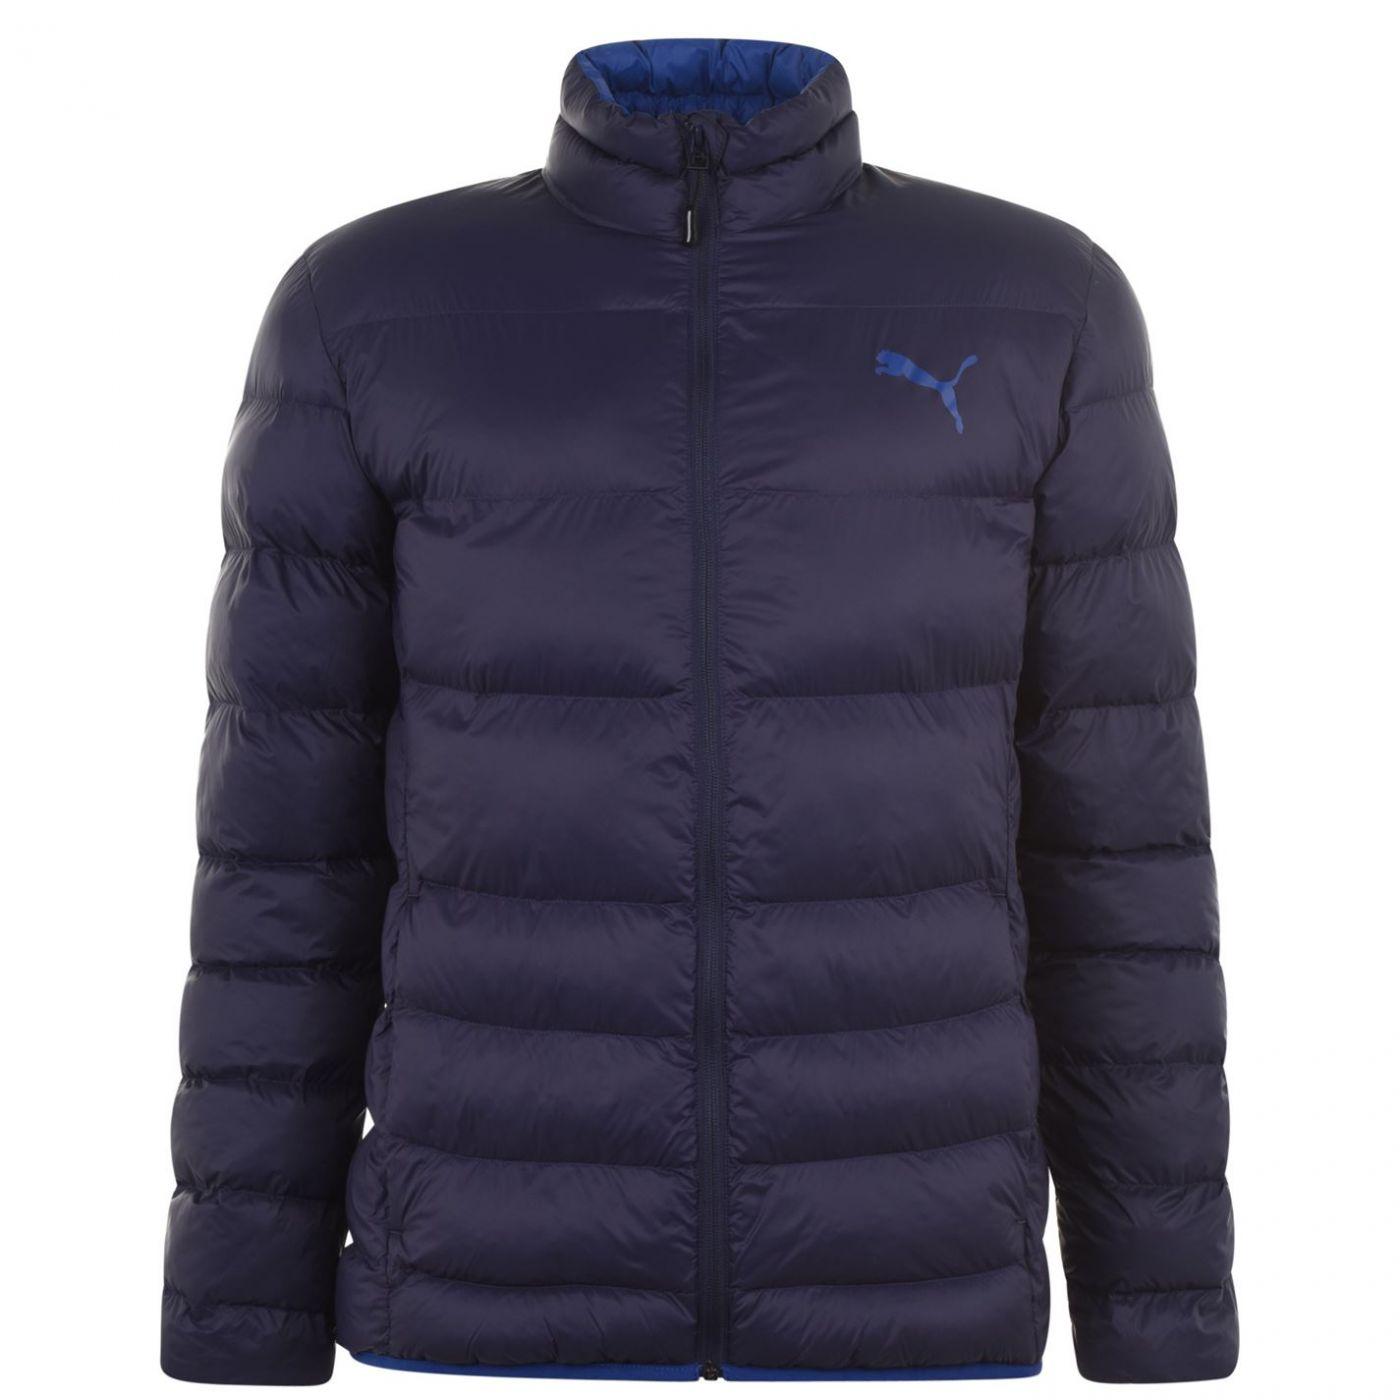 Puma Ultra Boost Jacket Mens